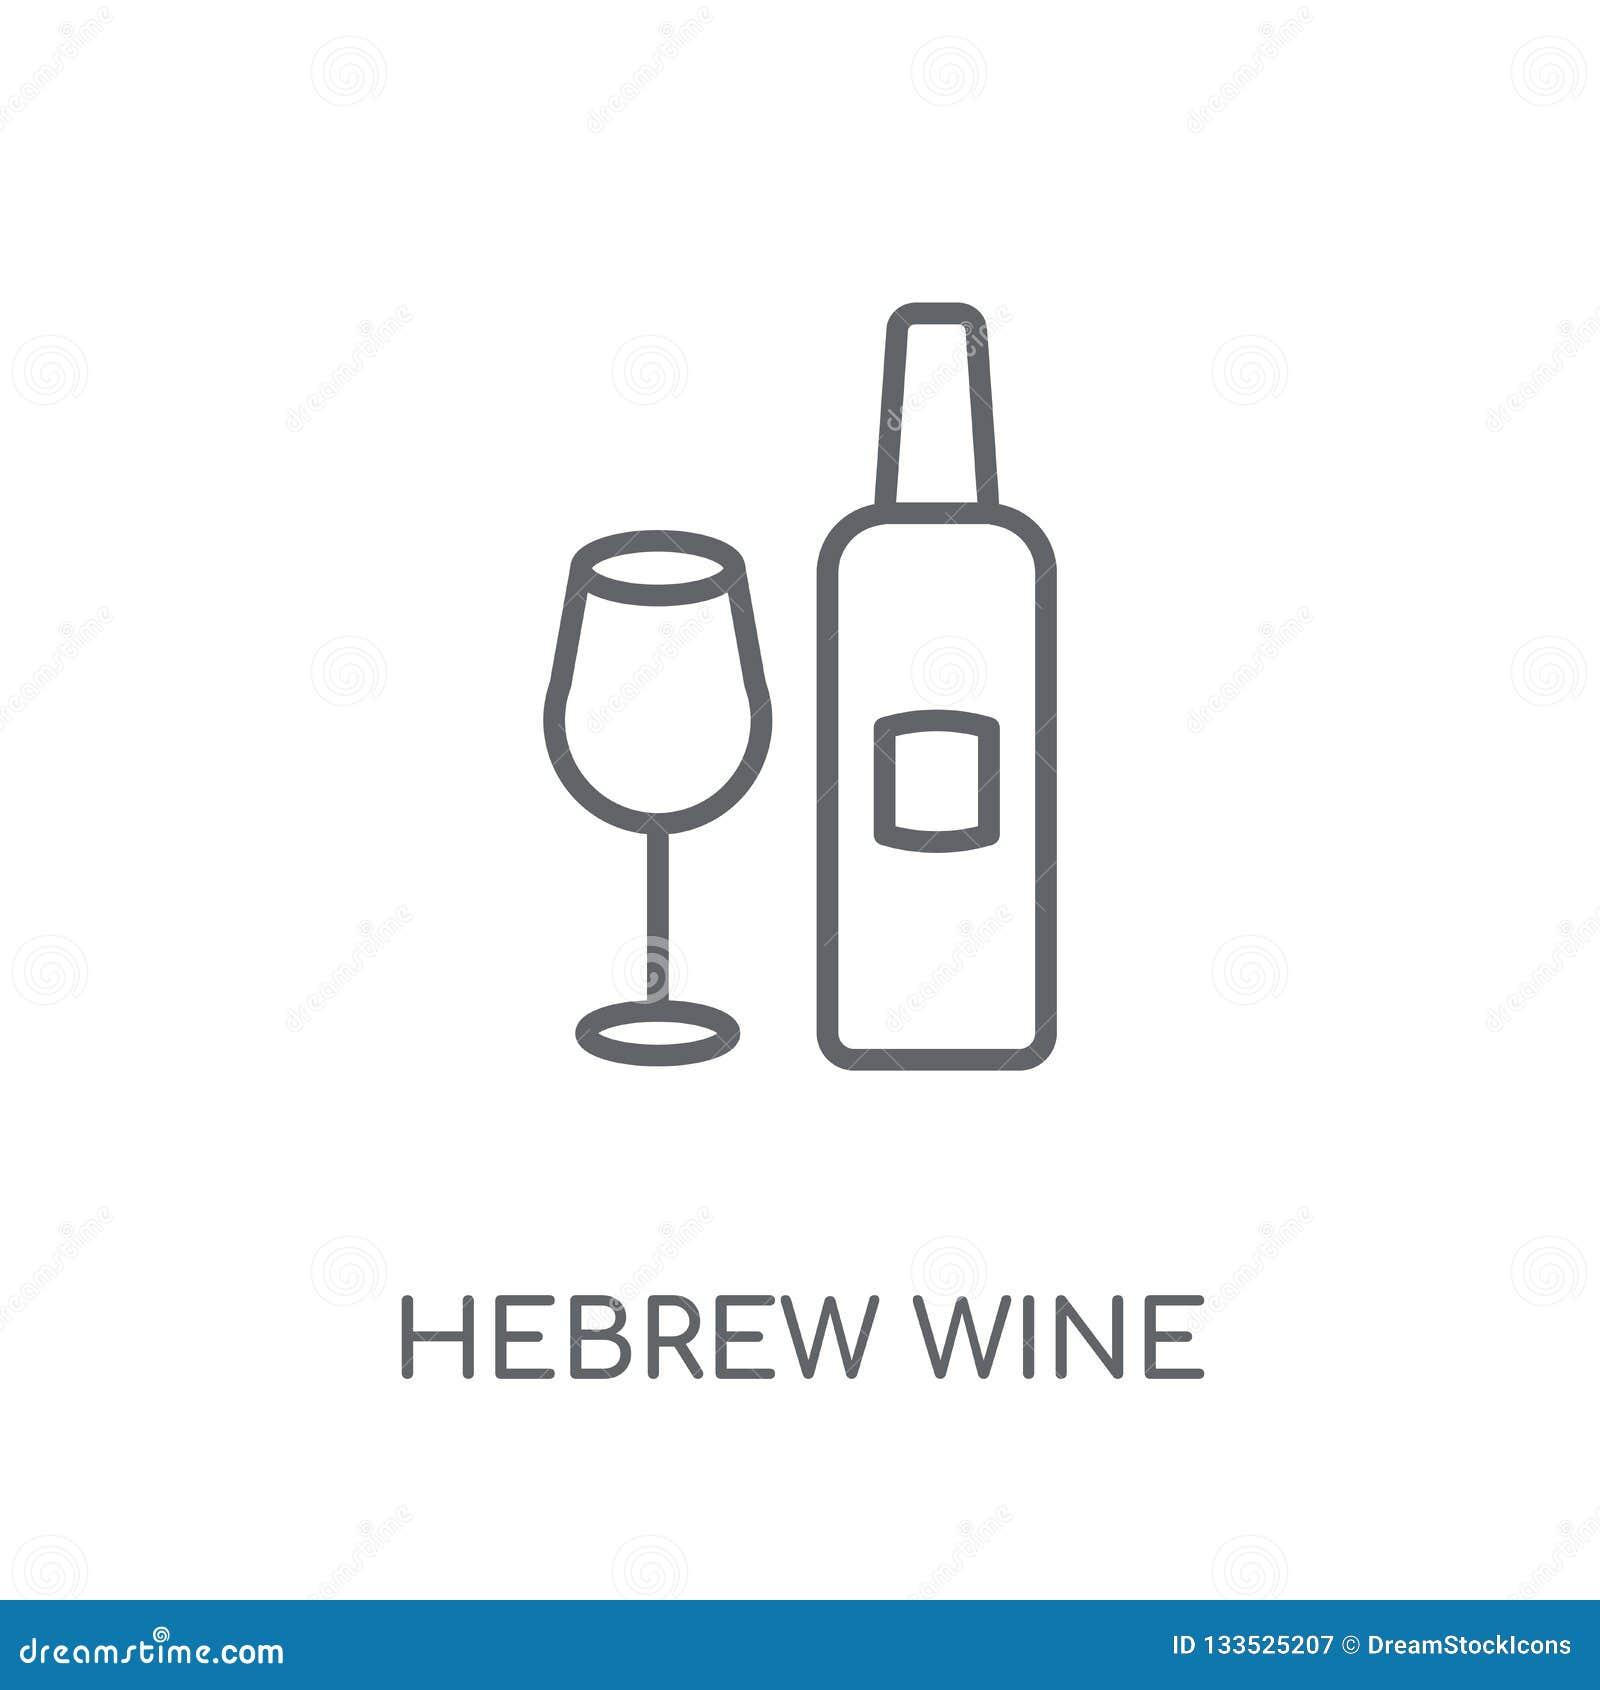 Lineare Ikone des hebräischen Weins Moderner Entwurf hebräisches Wein-Logokonzept